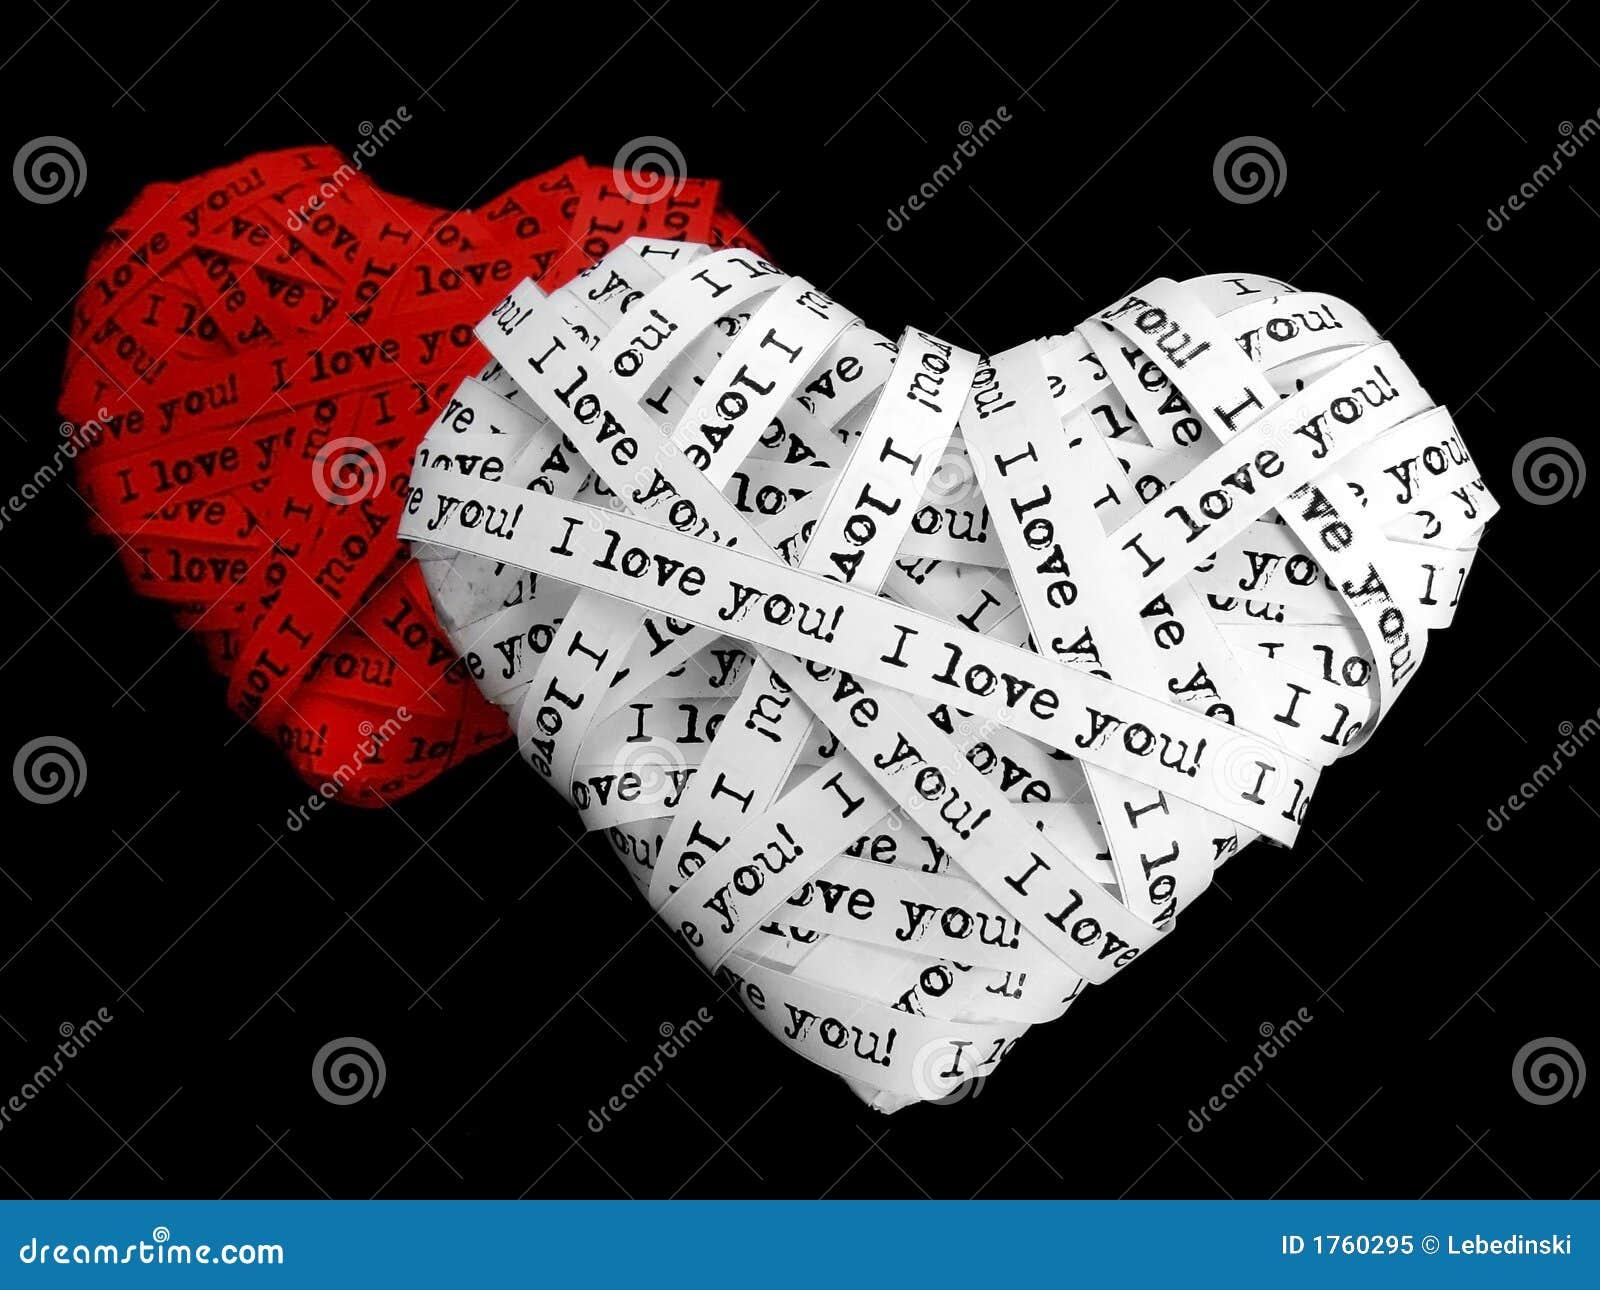 Decorative Love Hearts Stock Image Of Symbolic